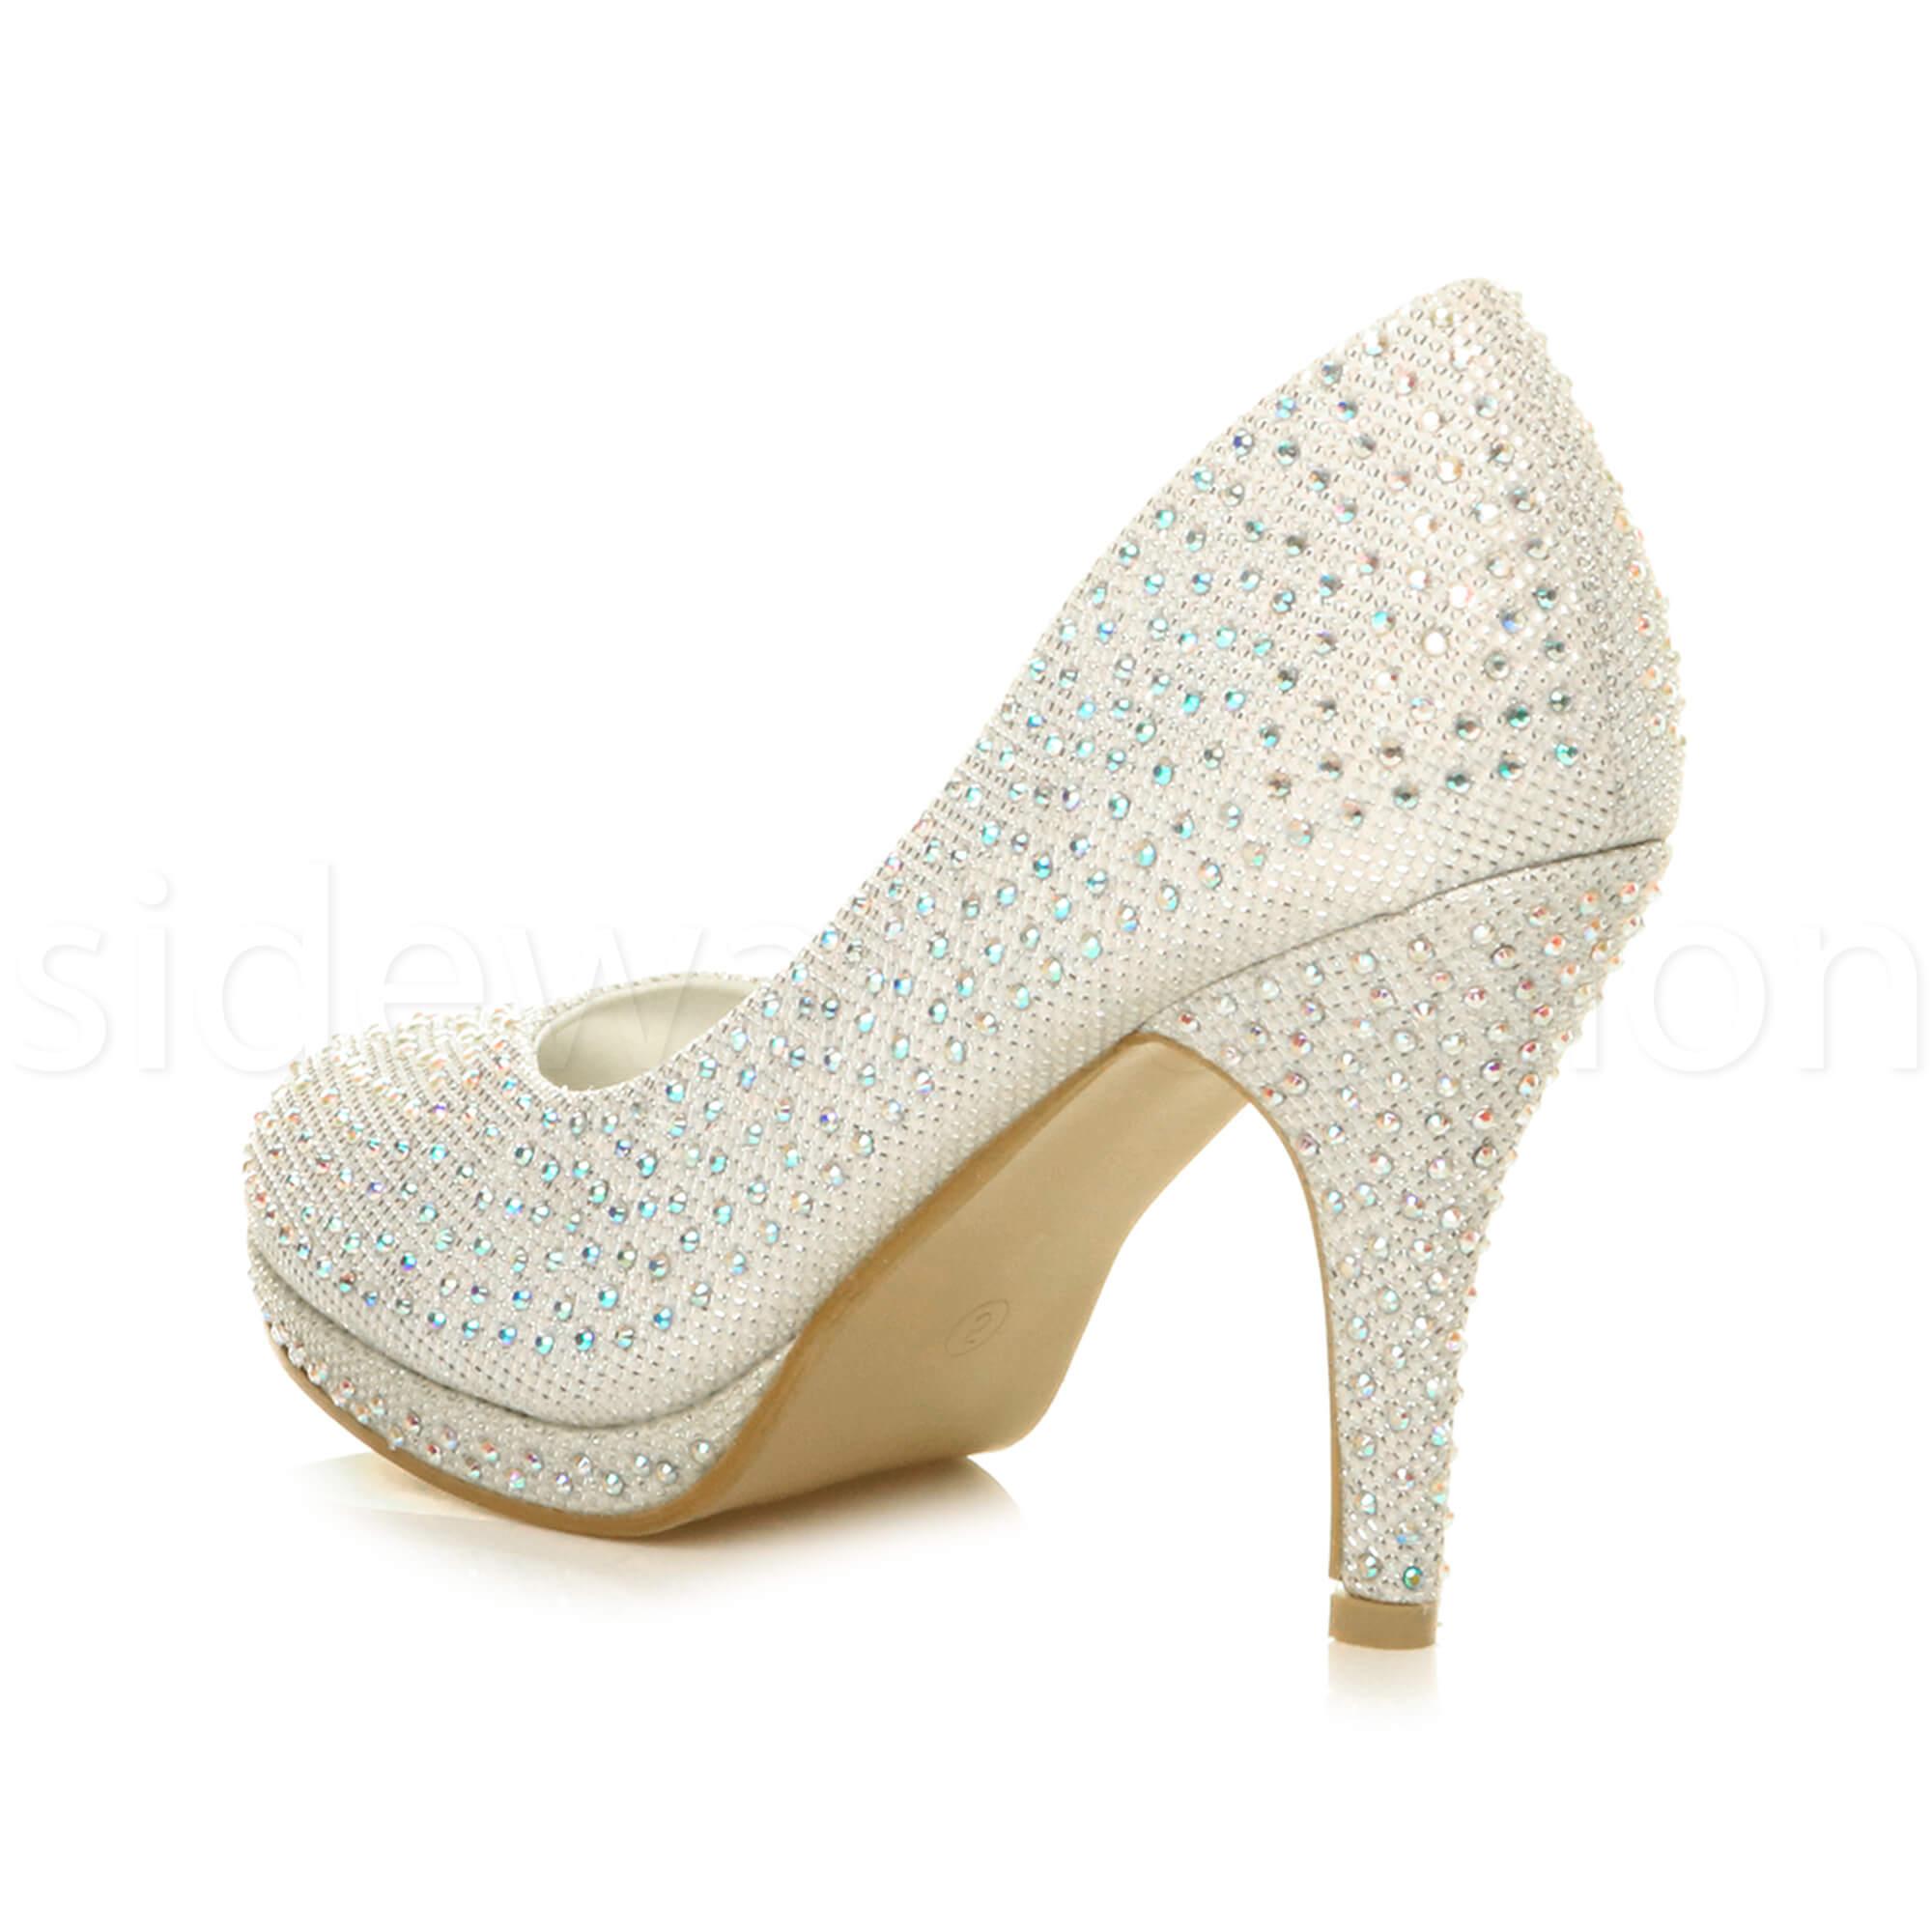 Womens-ladies-high-mid-heel-platform-wedding-evening-bridesmaid-court-shoes-size thumbnail 89